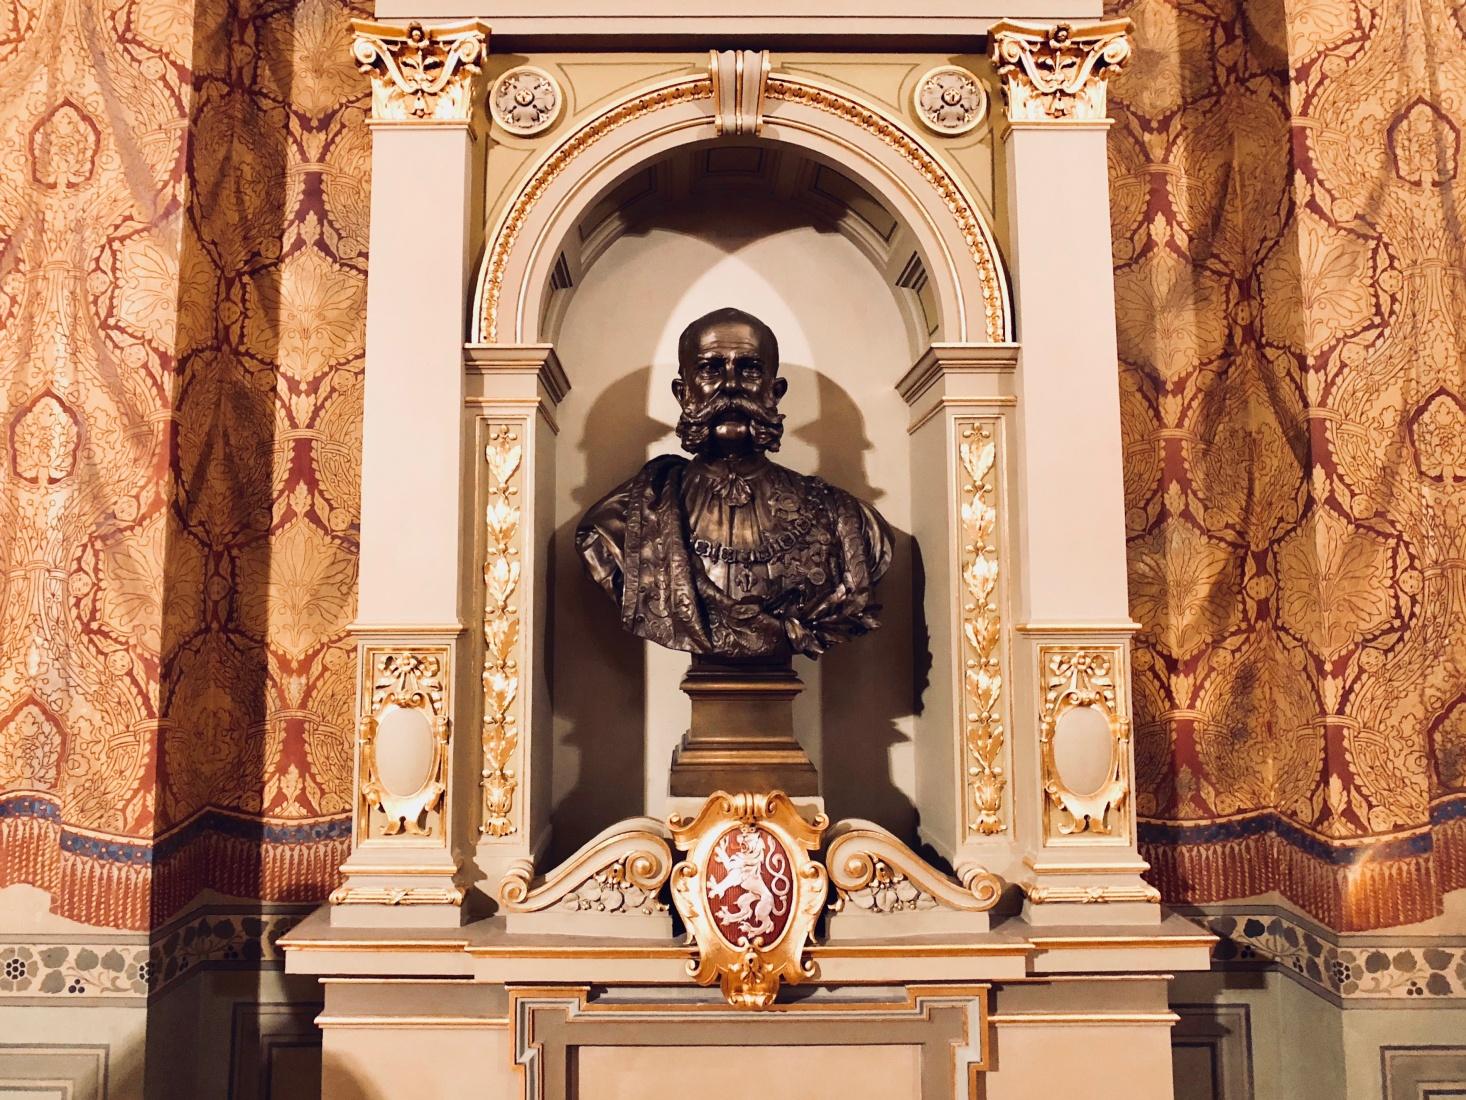 Bust of Austro-Hungarian Emperor Franz Joseph I.